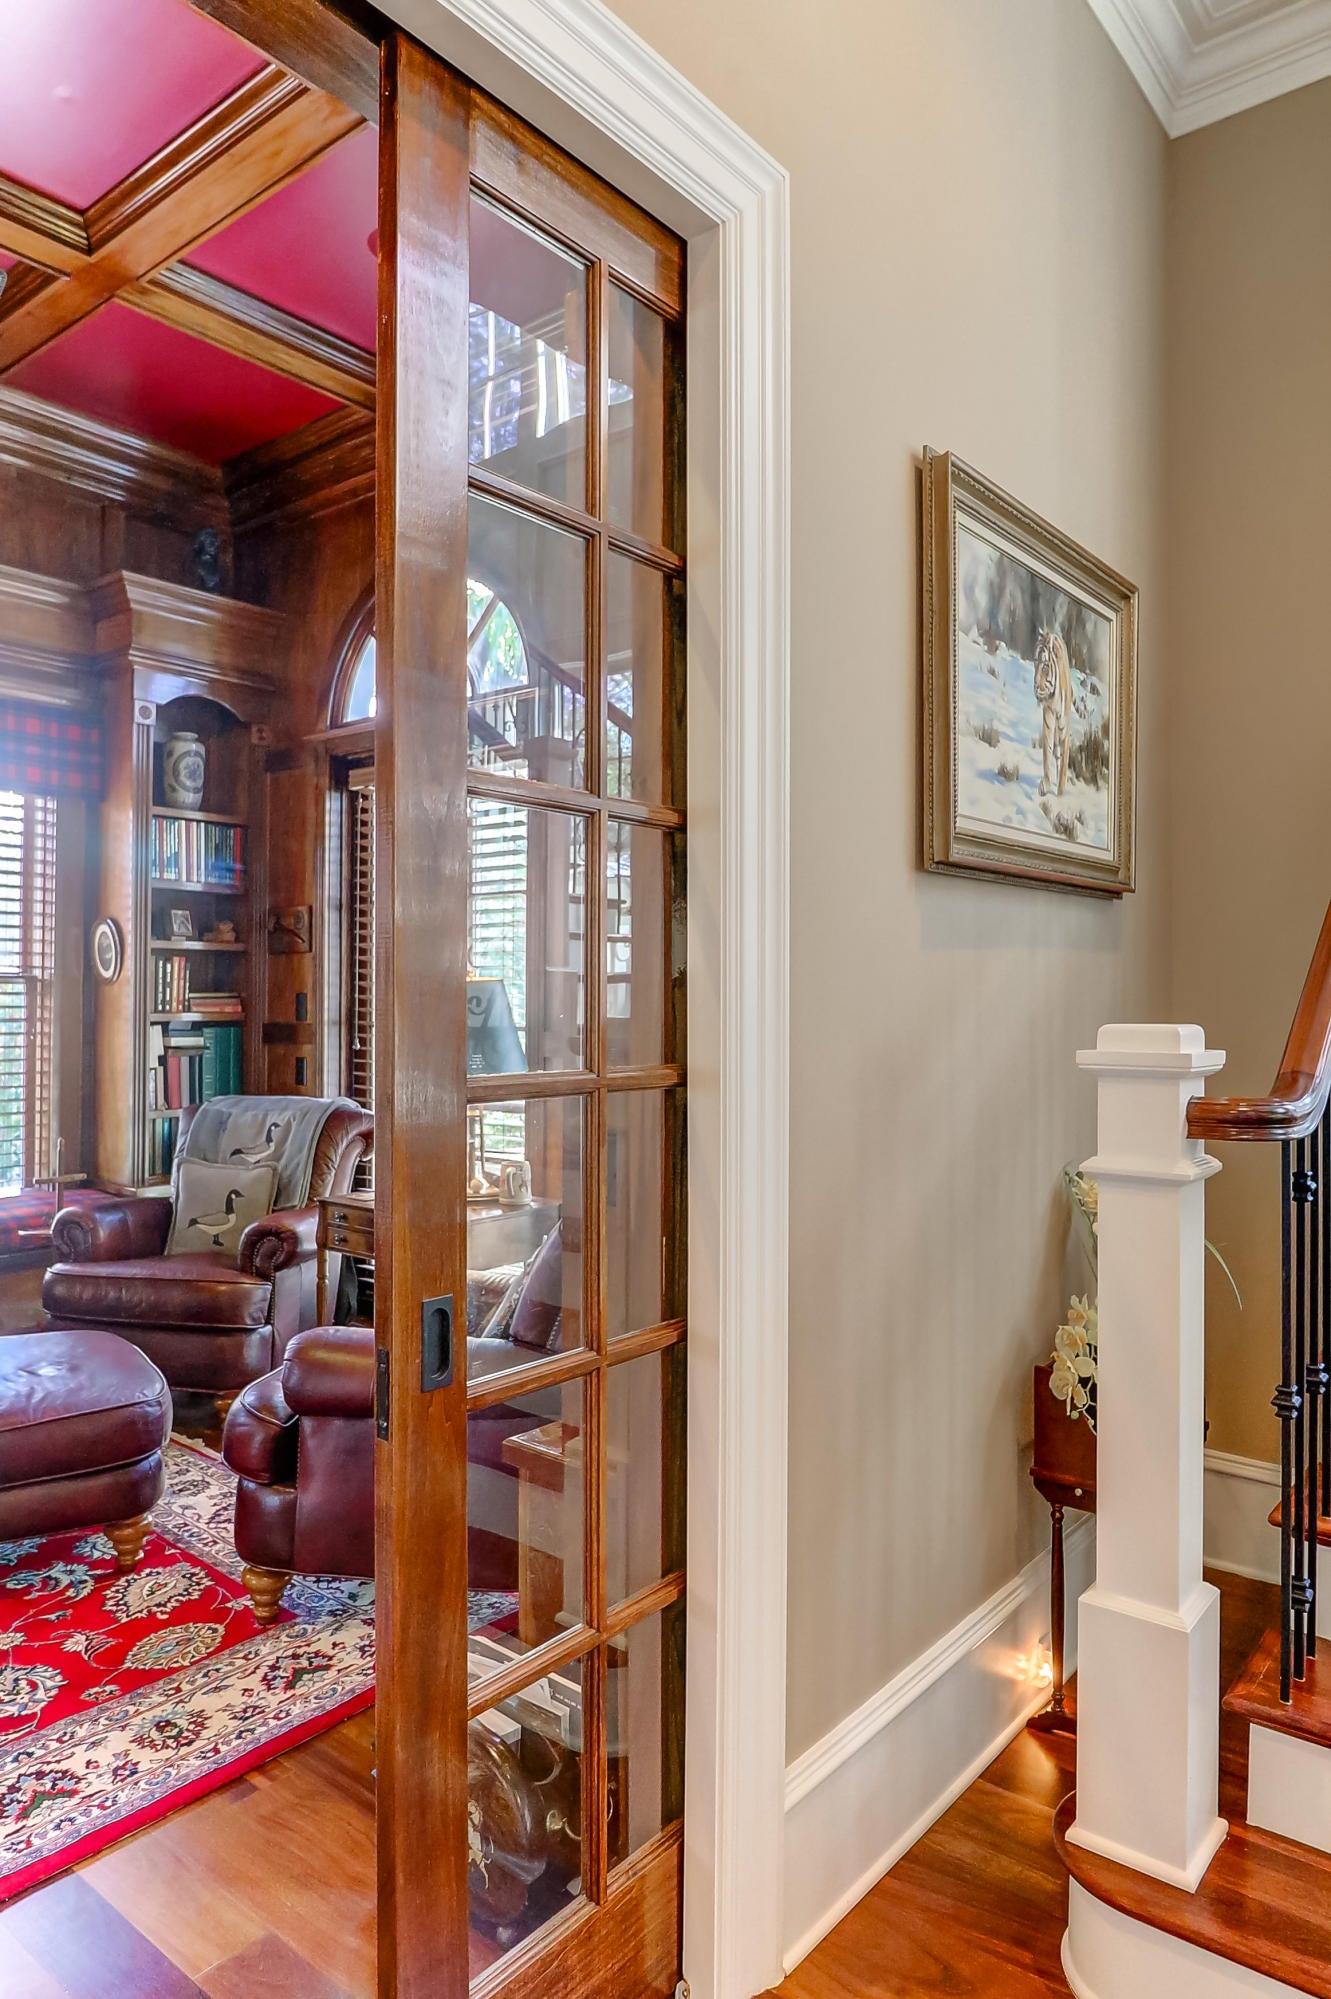 Daniel Island Homes For Sale - 107 Balfour, Charleston, SC - 59